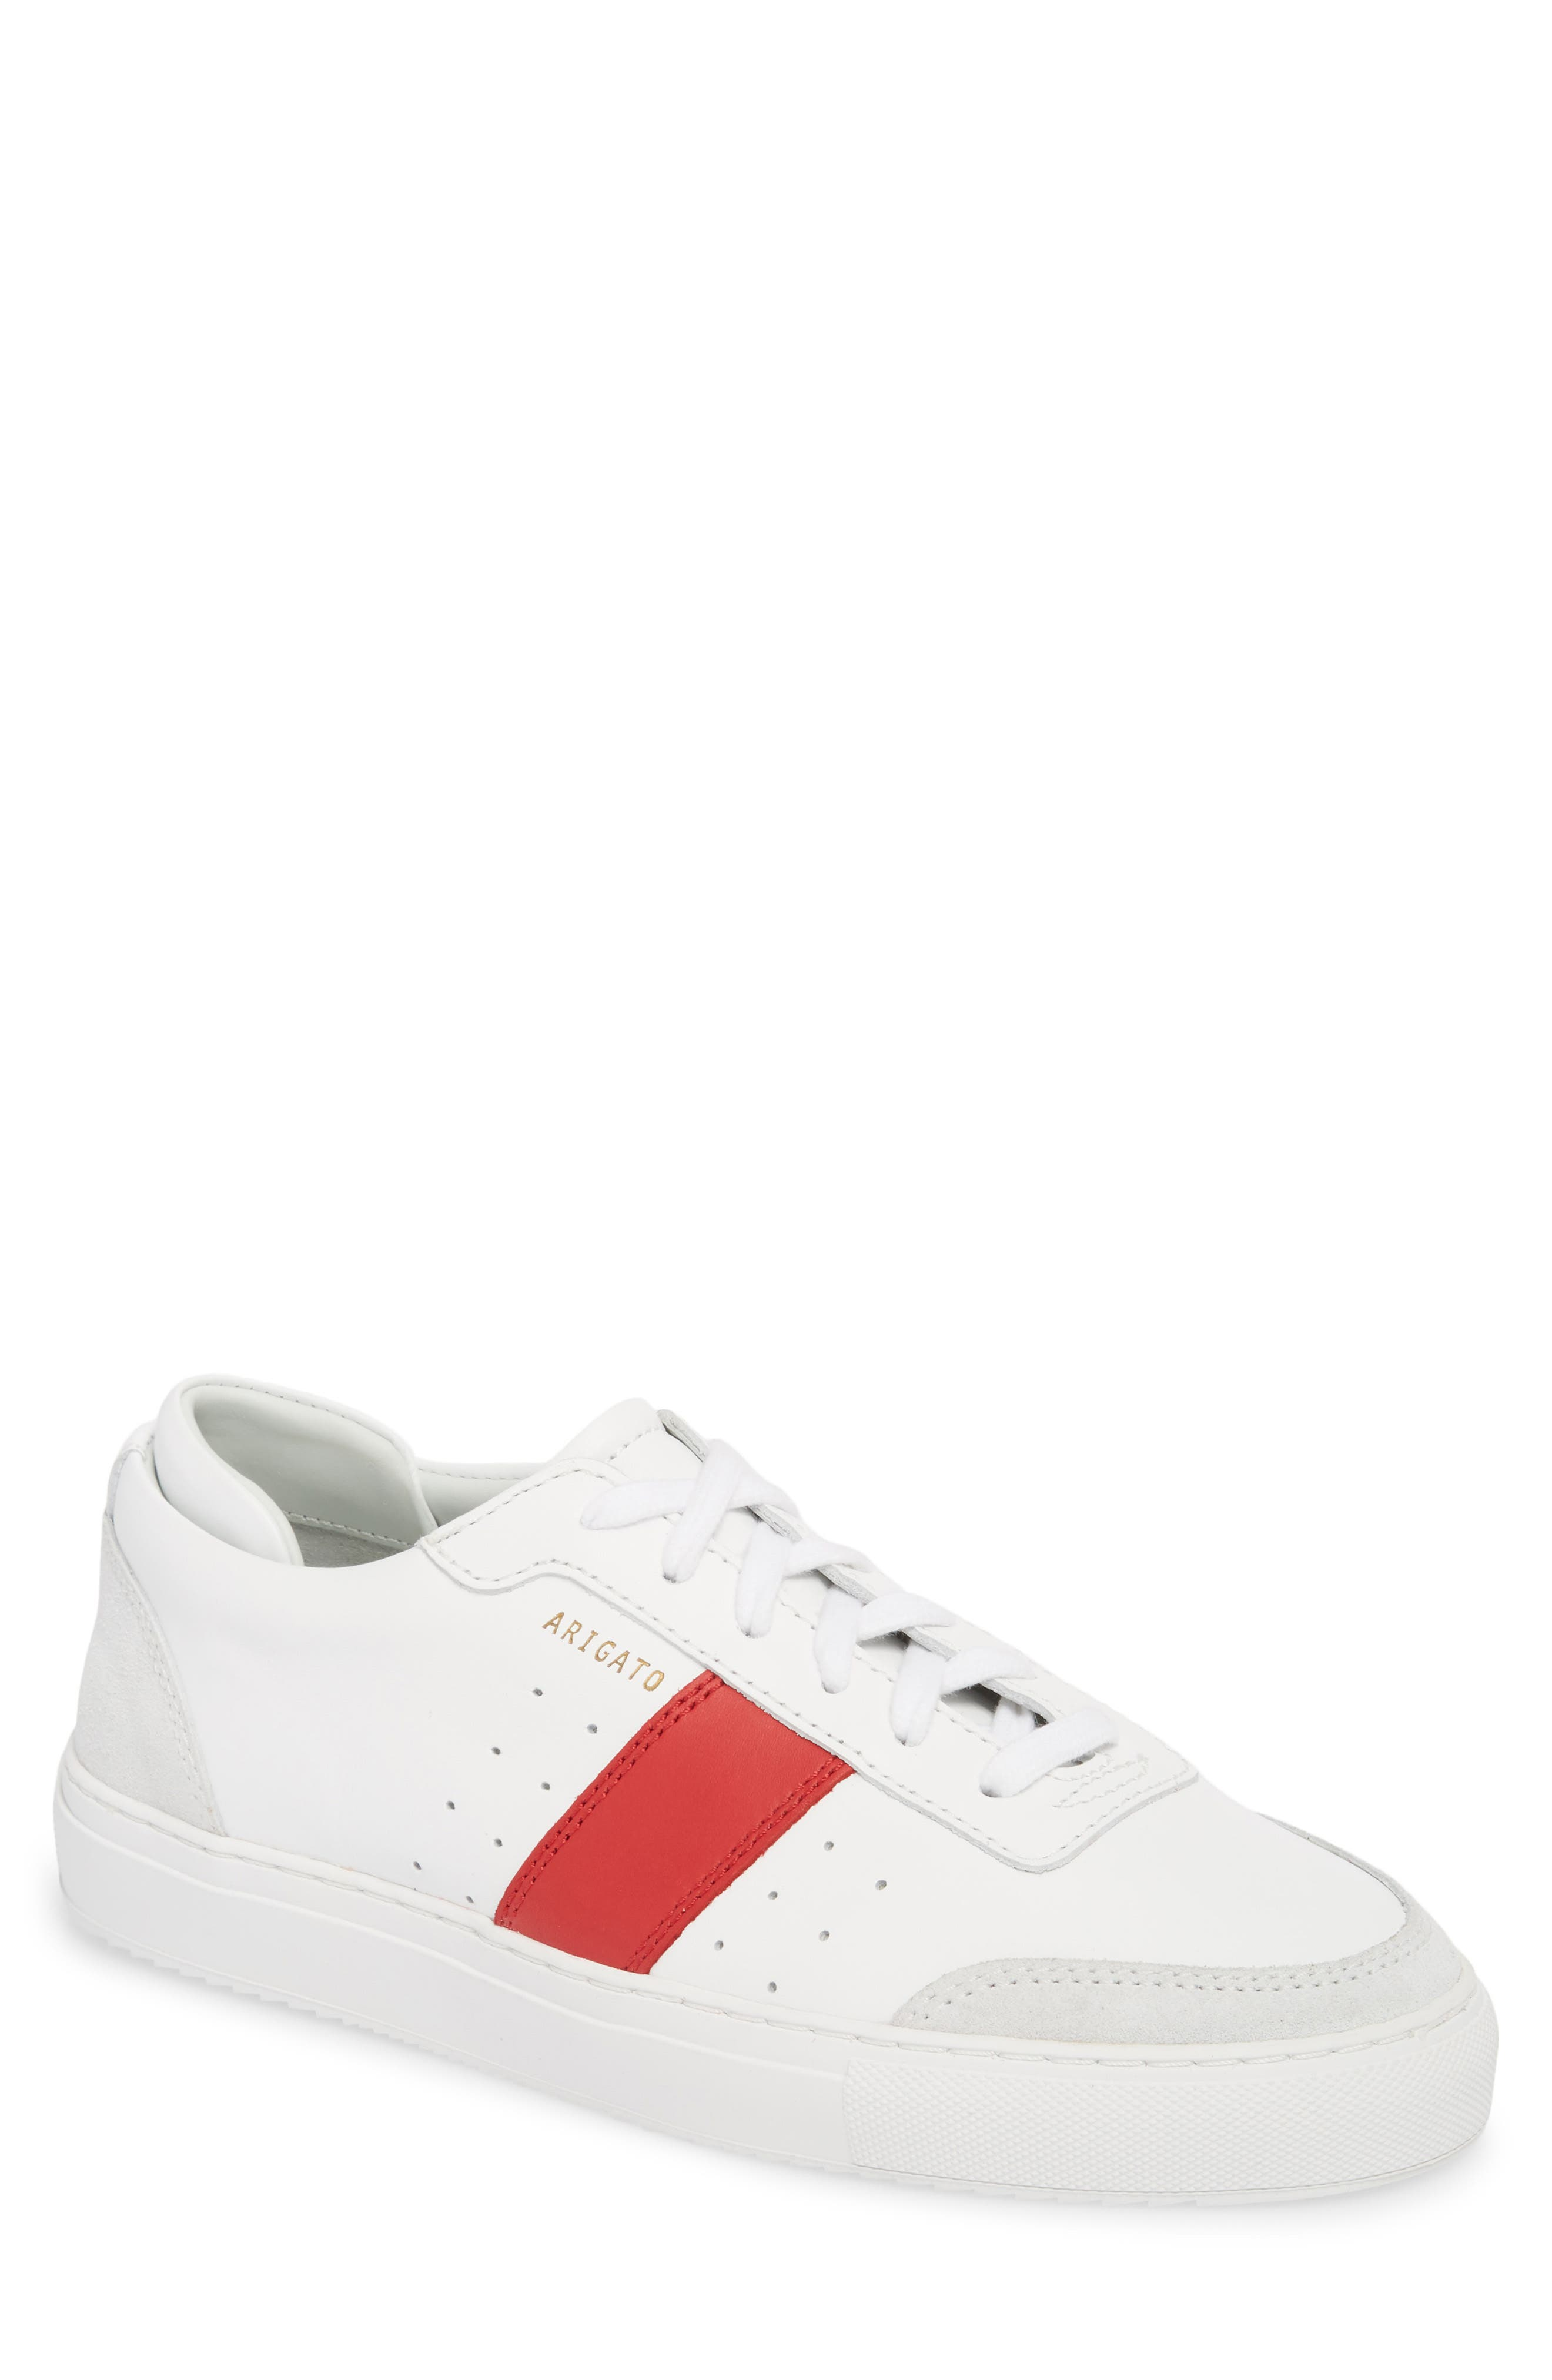 Dunk Striped Sneaker,                             Main thumbnail 1, color,